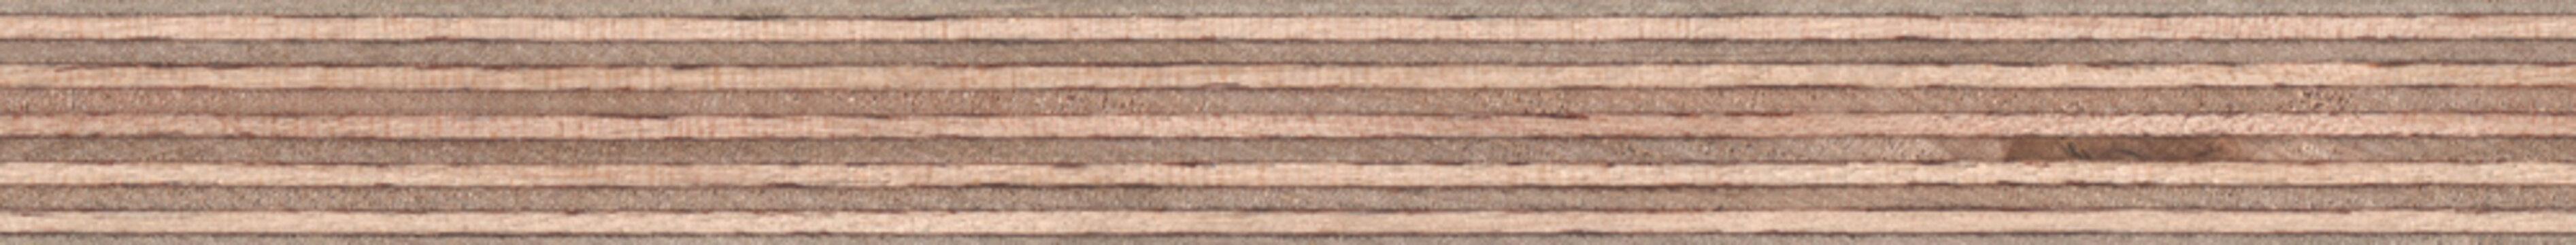 Multiplex  Sperrholz Schichtholz Stirnholz Kante - Kachelbar Seamless Tileable